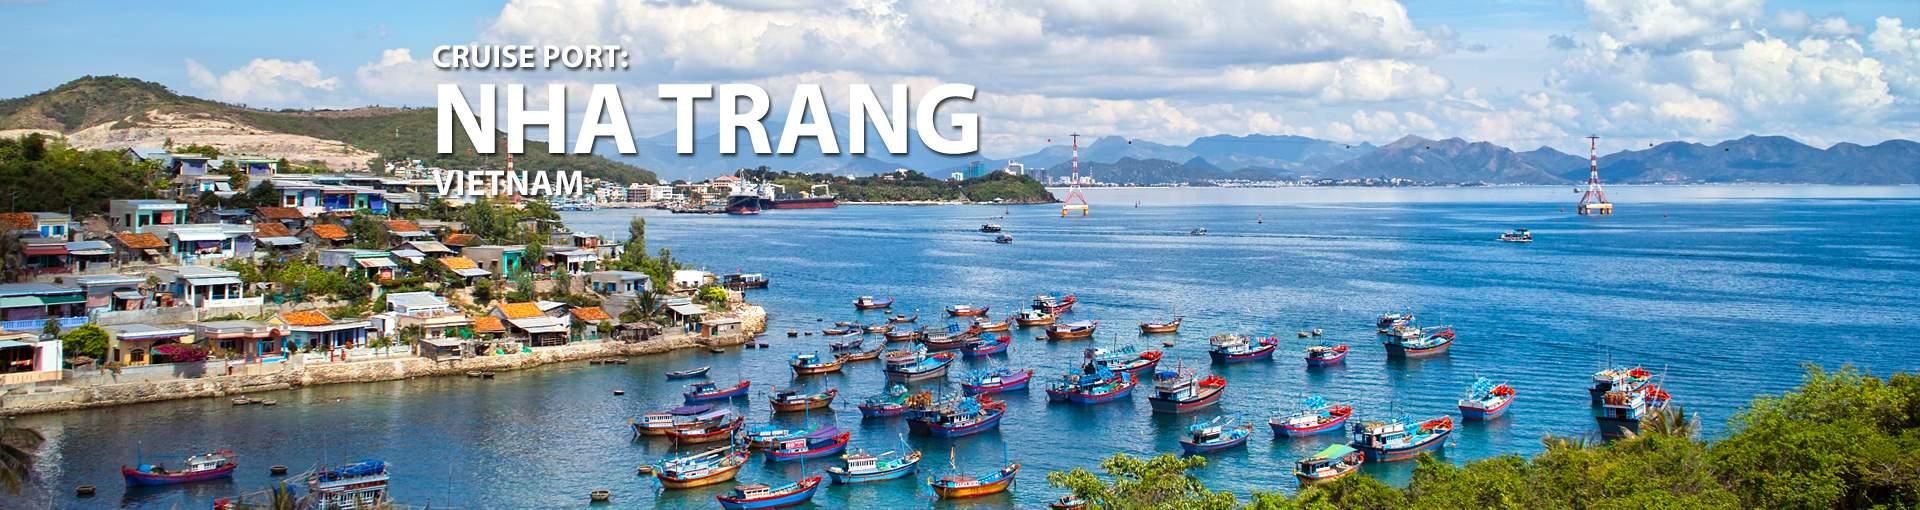 Cruise Port: Nha Trang, Vietnam